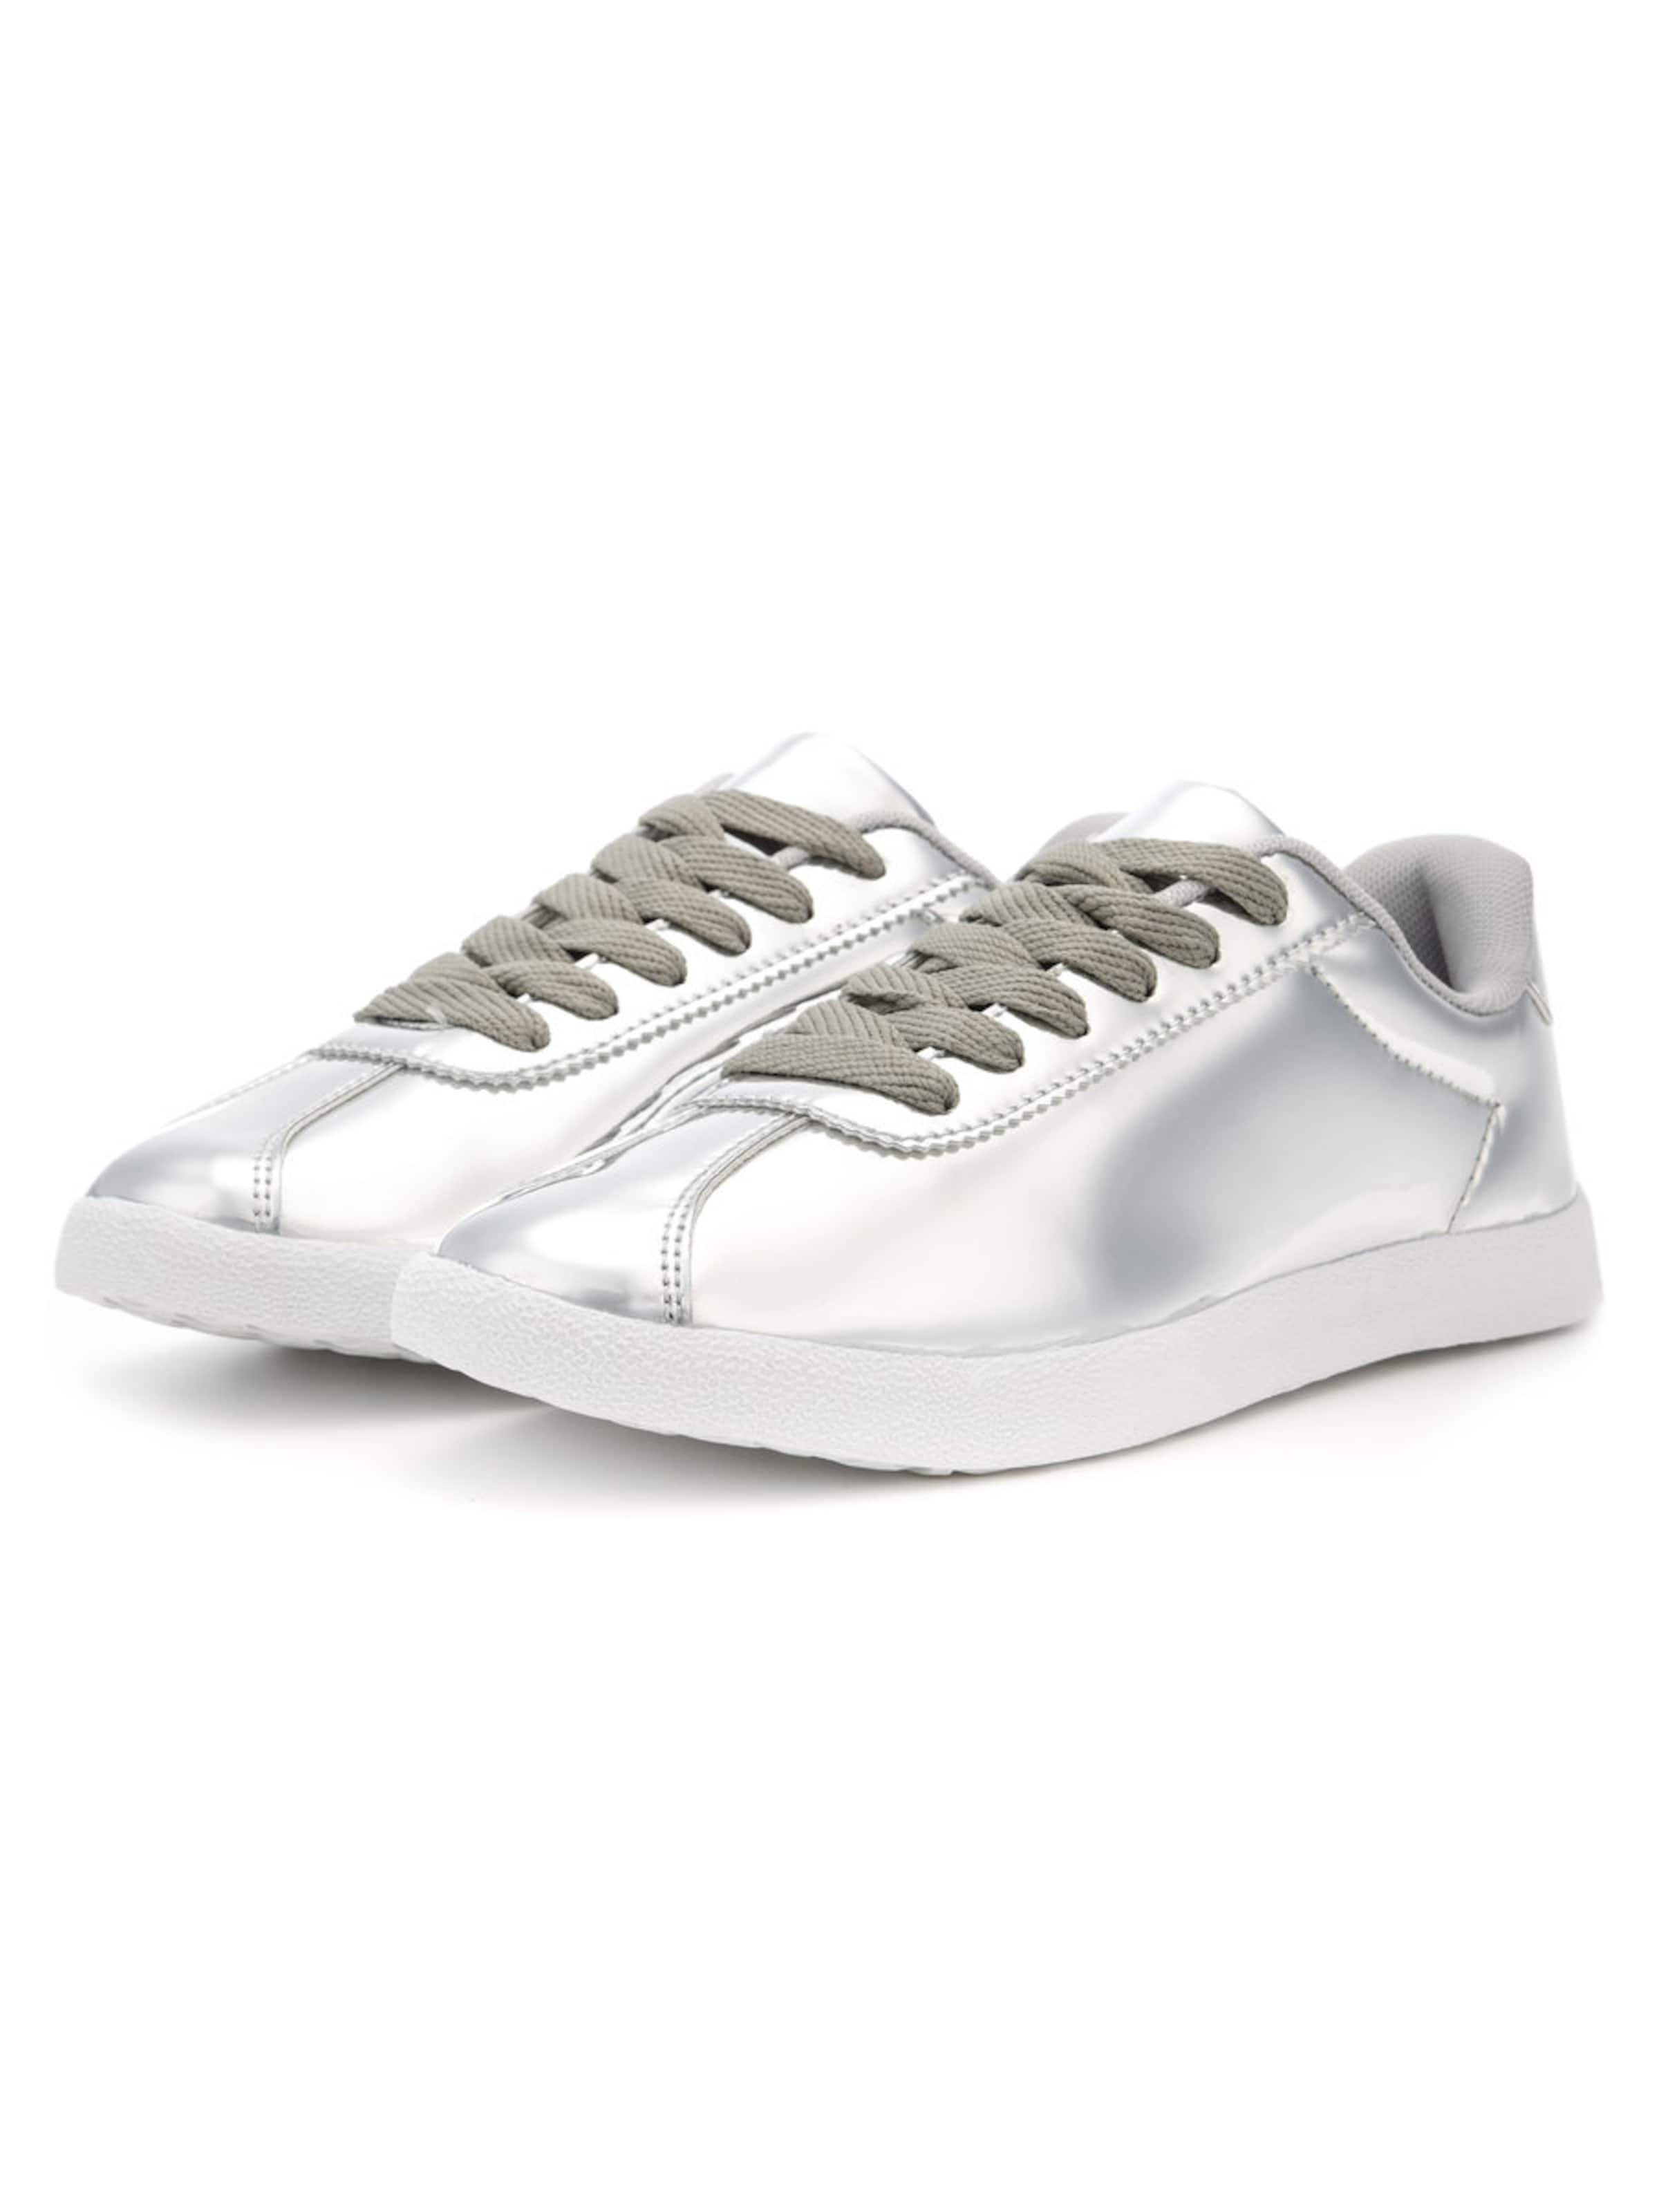 Auslass Visa Zahlung Verkauf Vorbestellung Bianco Schuhe Outlet Besten Großhandel qkFgqx